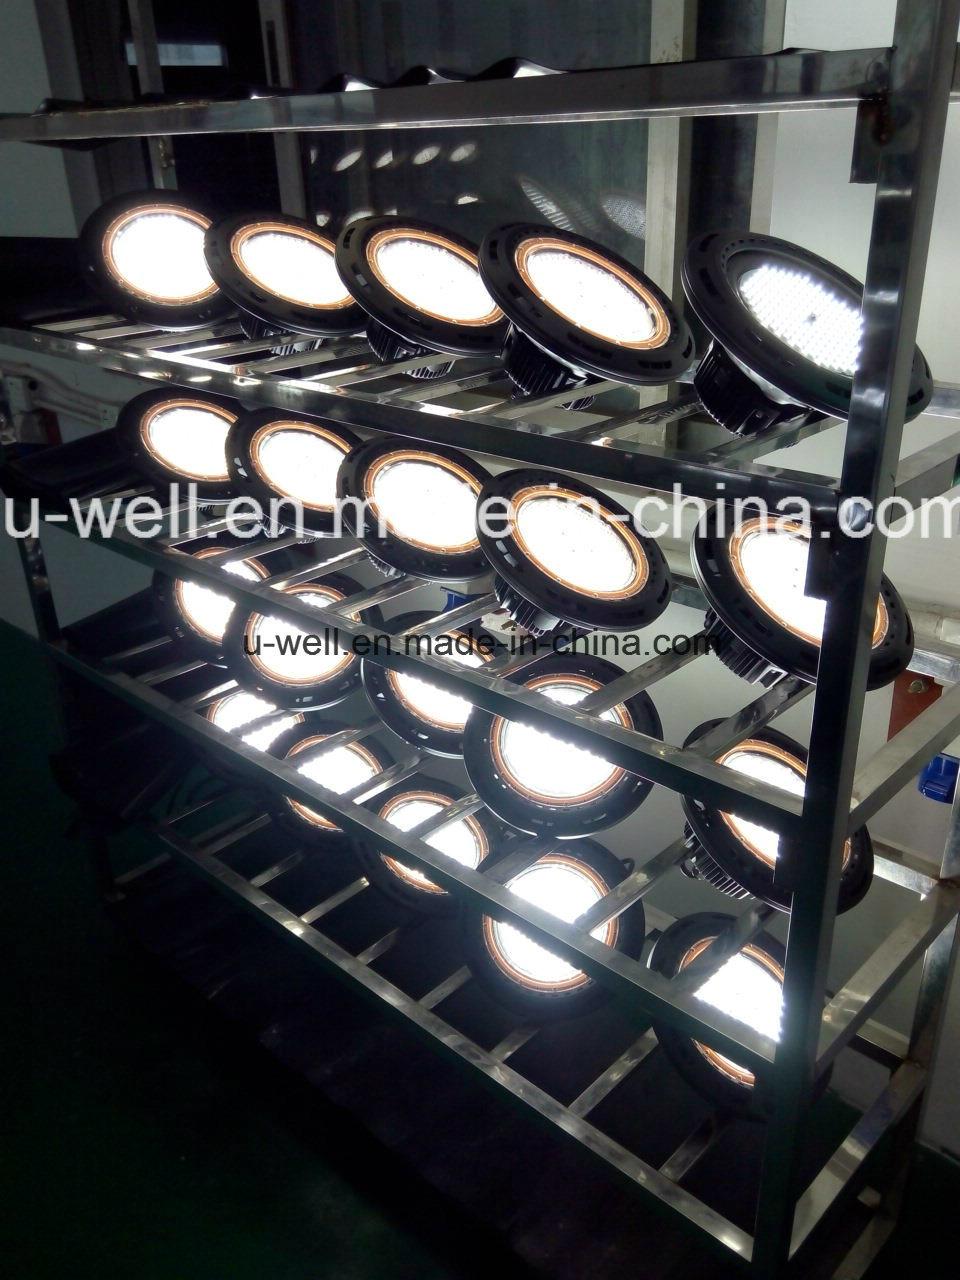 China Industrial UFO Highbay Lighting IP65 Waterproof 130lm/W 100W 160W 200W LED High Bay Light - China LED High Bay Light, UFO LED High Bay Light